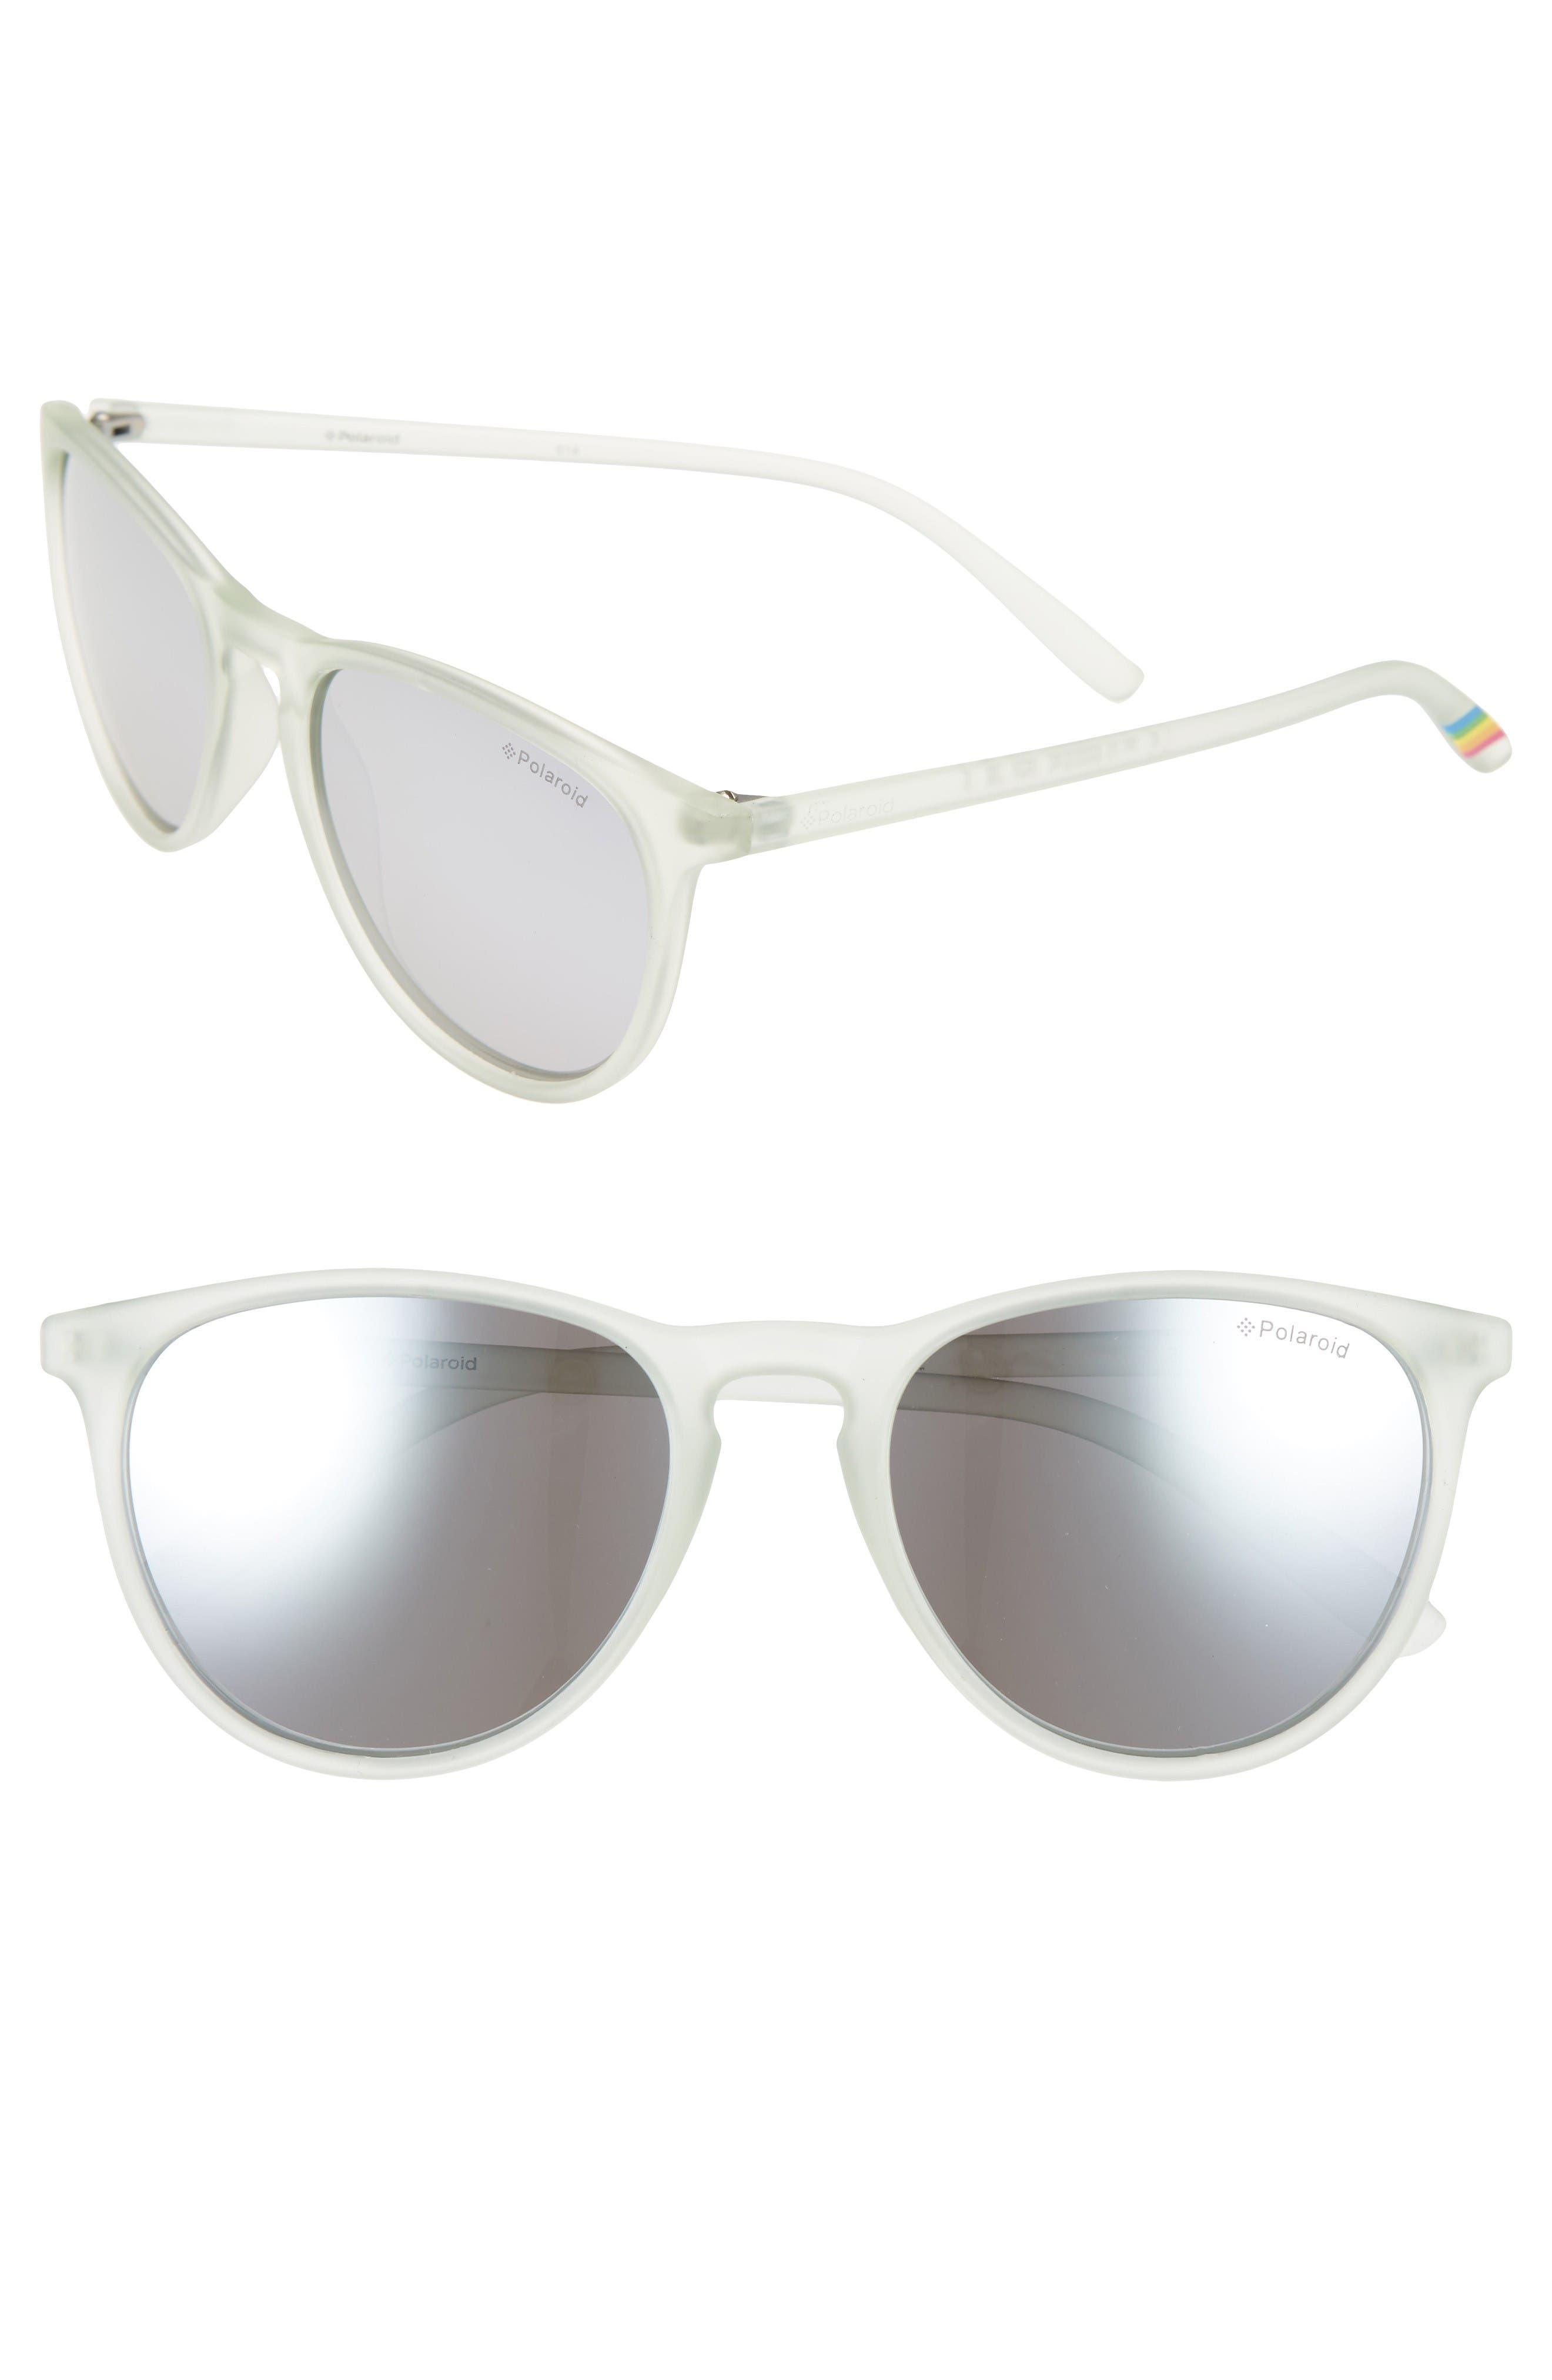 Polaroid Eyewear 6003/N 54mm Polarized Sunglasses